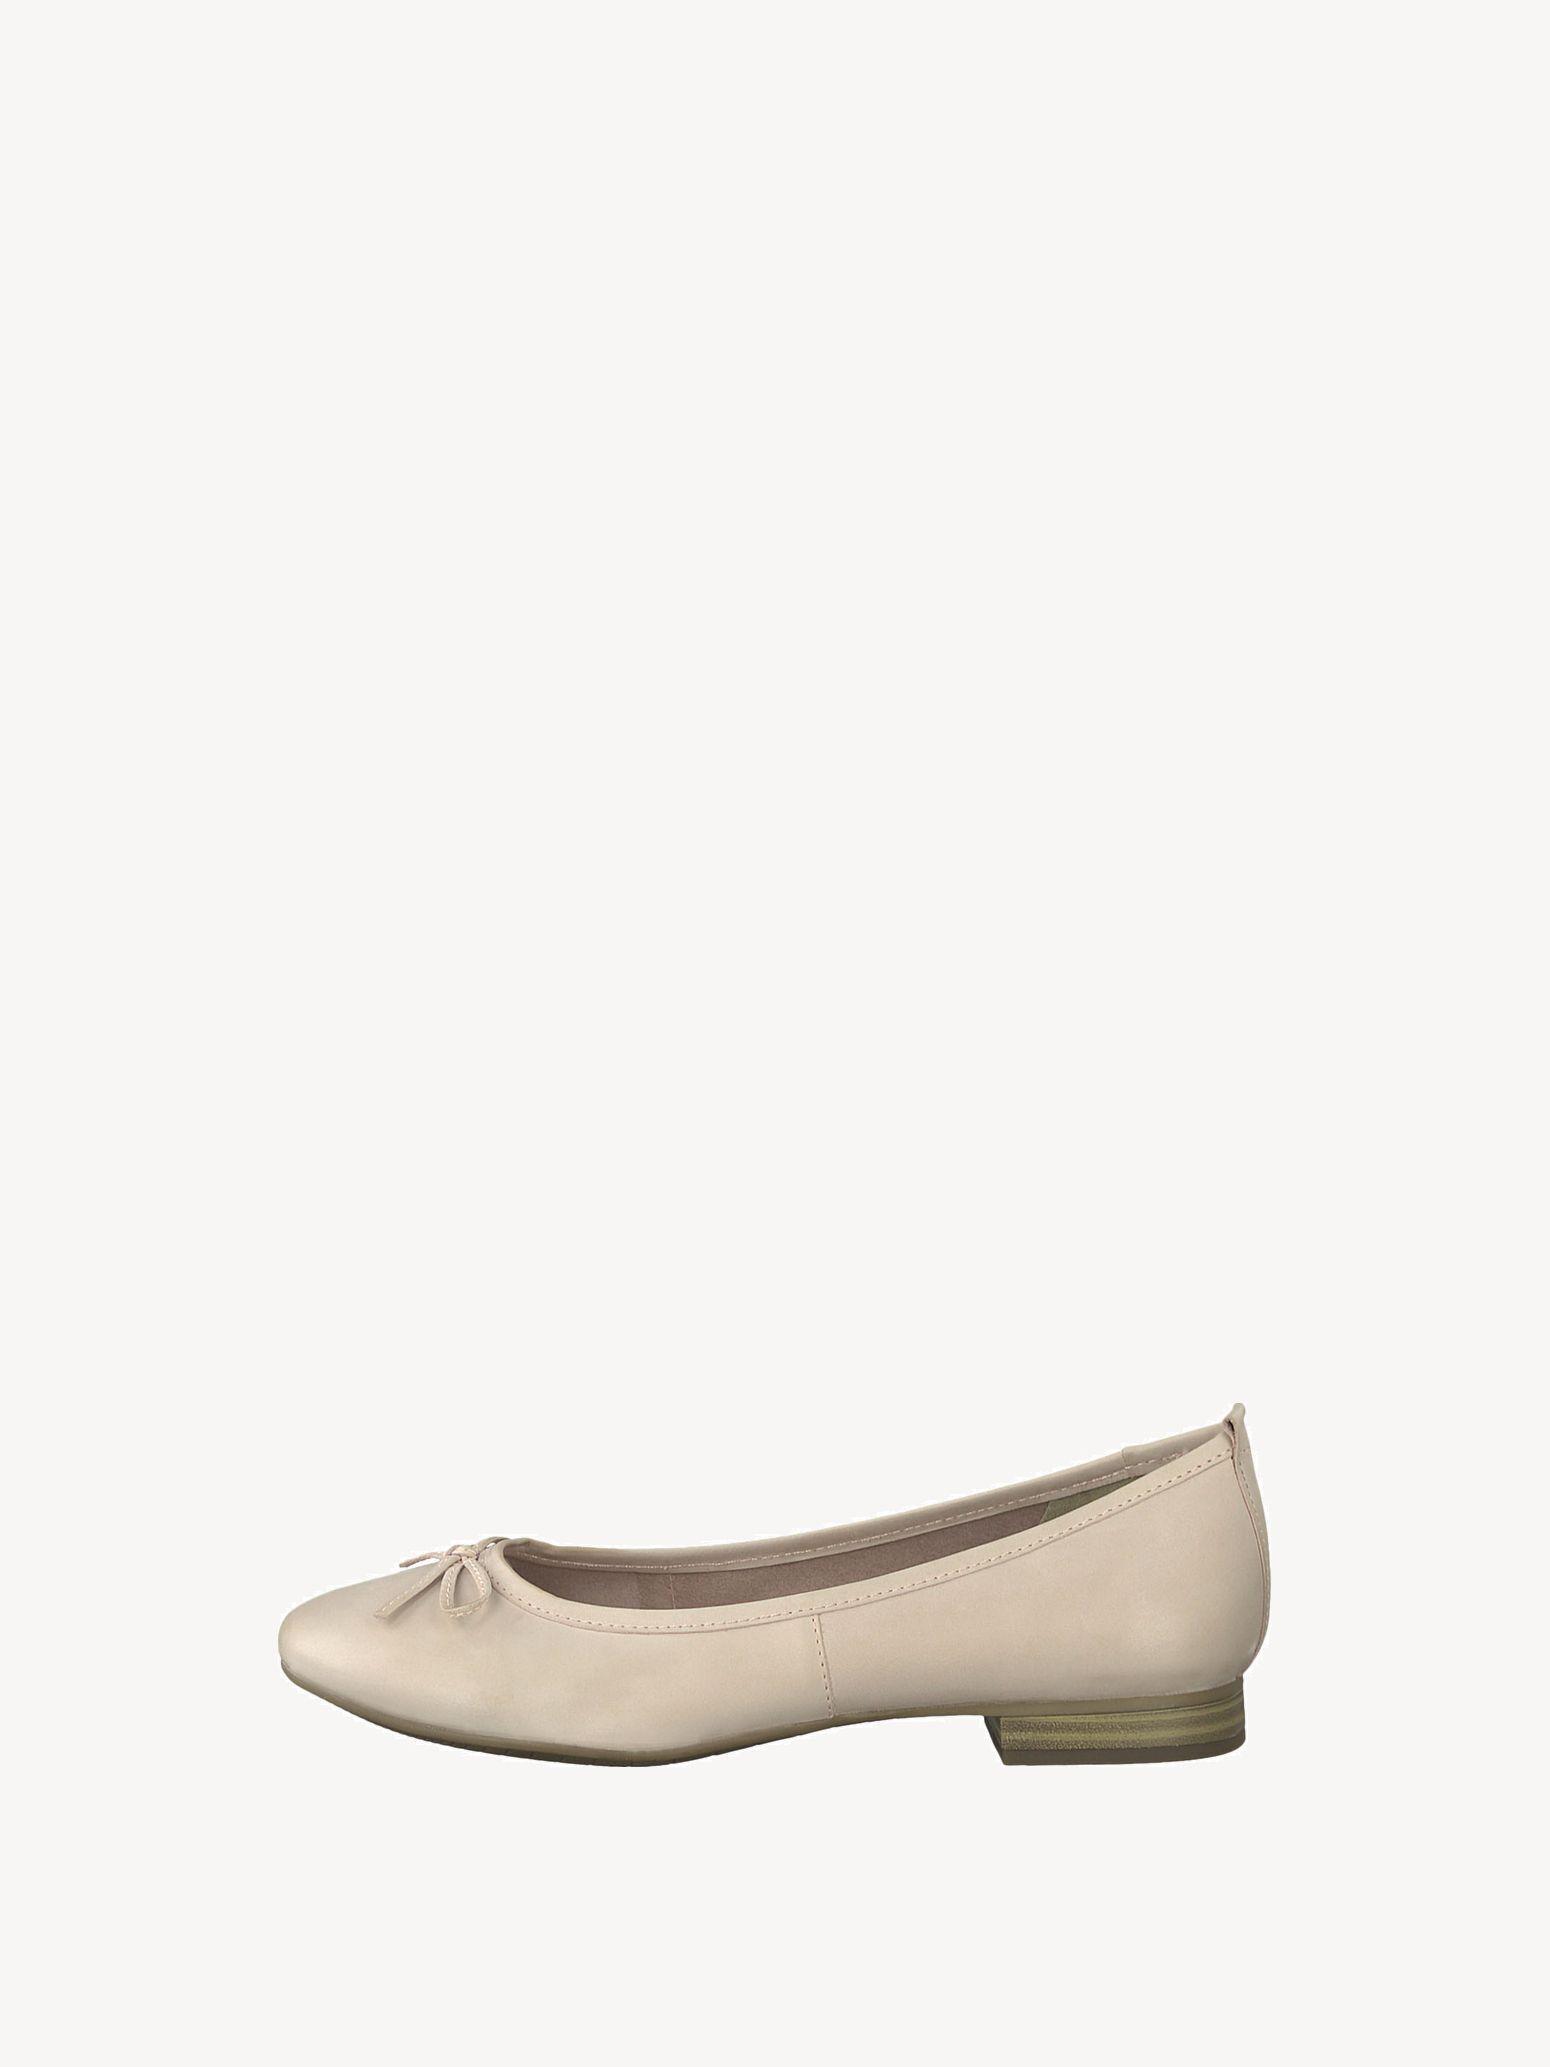 Tamaris ballerine petit talon noir femme chaussures